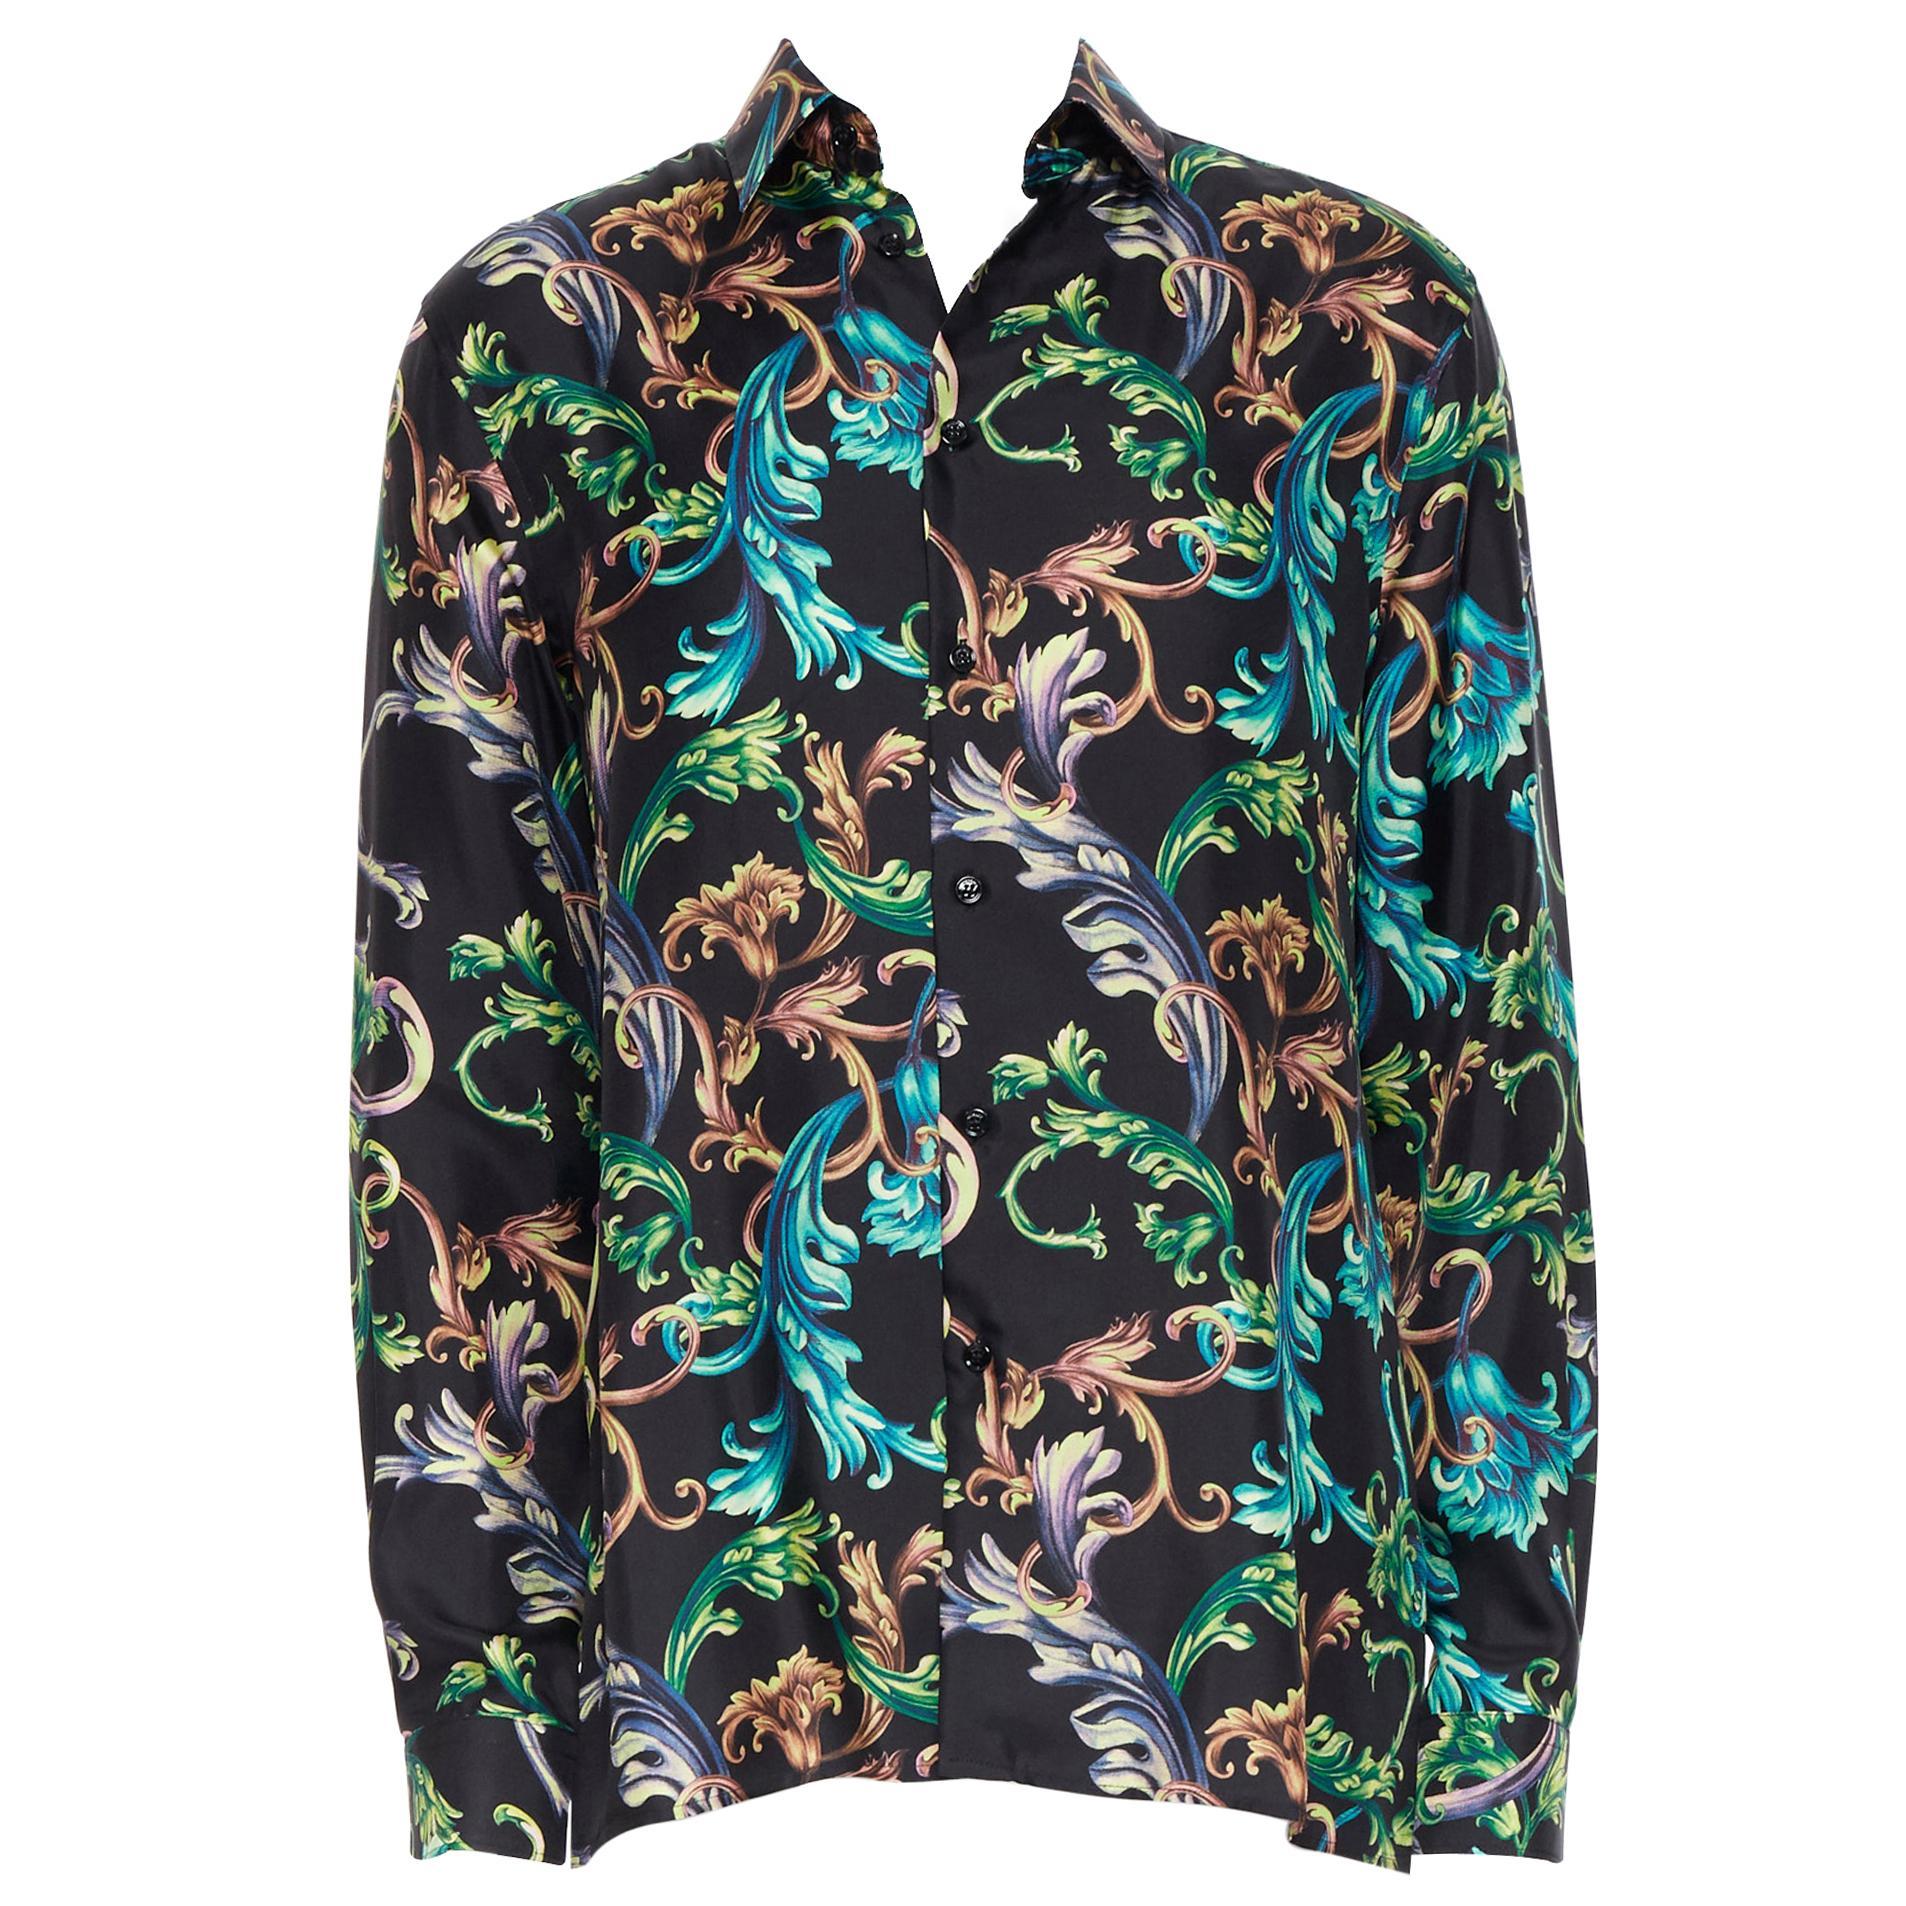 new VERSACE  Acid Baroque black green blue floral 100% silk shirt EU38 S